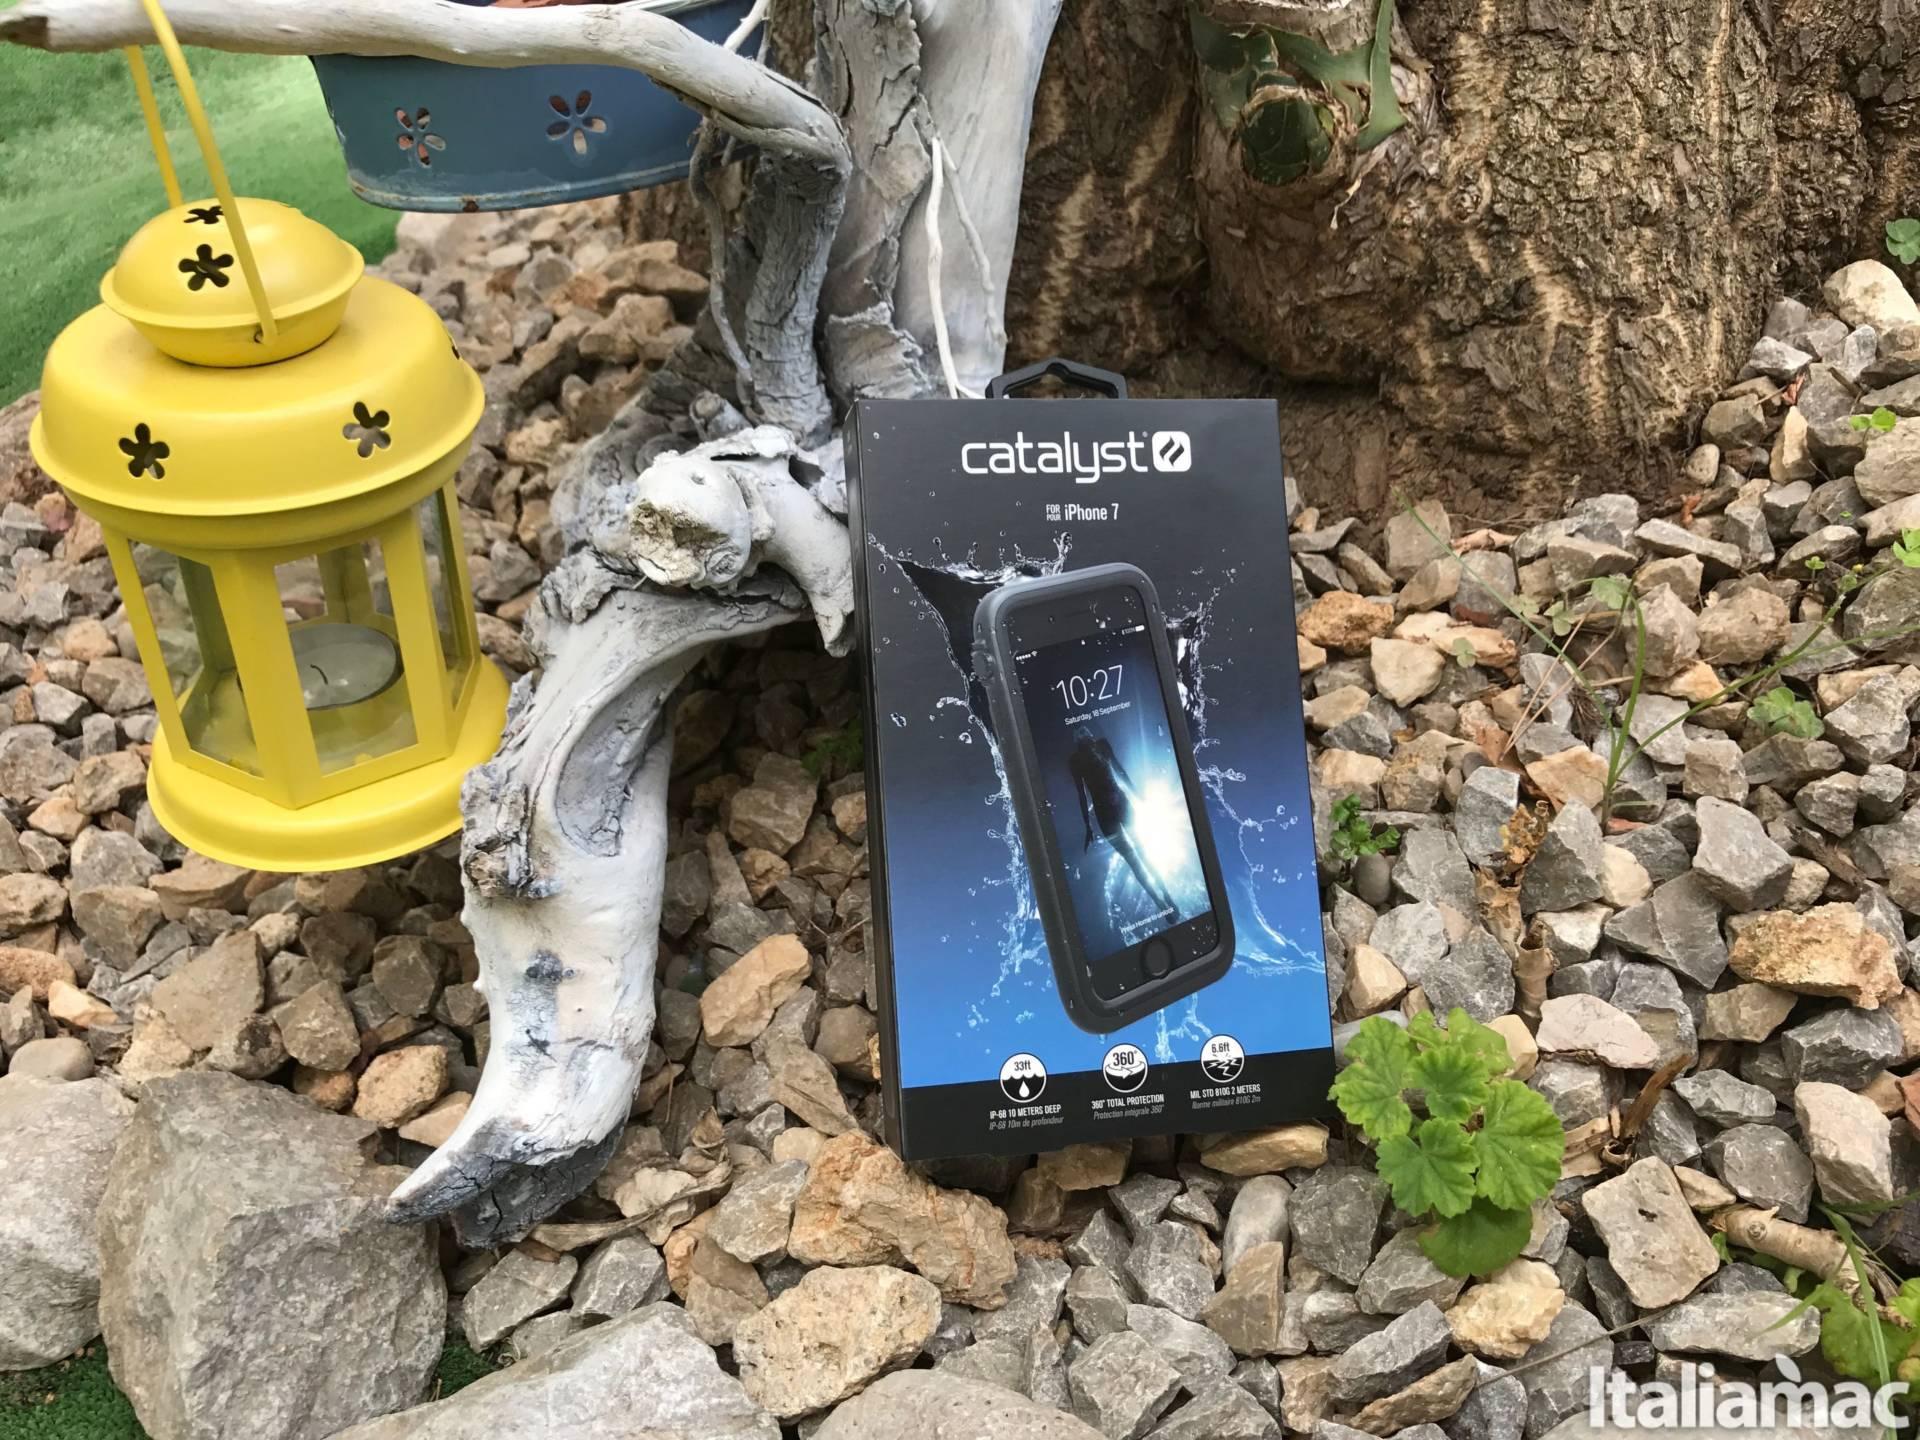 %name Catalyst: Il case impermeabile fino a 10 metri per iPhone 7